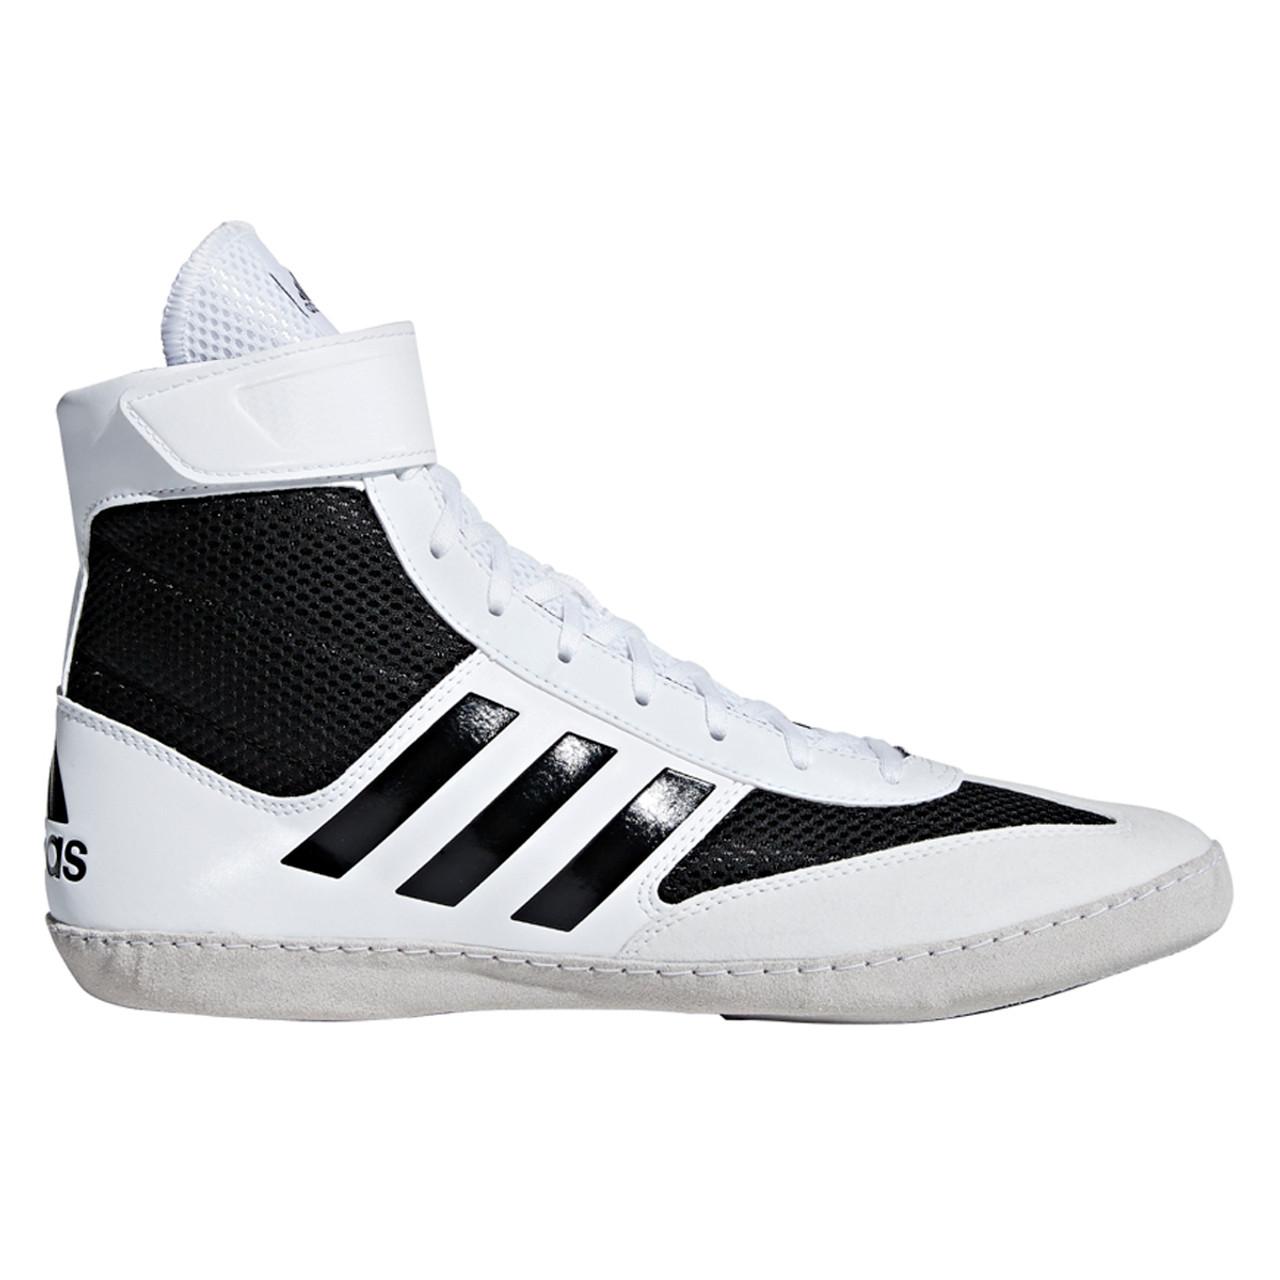 de044db90dc Adidas Combat Speed 5 Men s Wrestling Shoes AC7501 - White